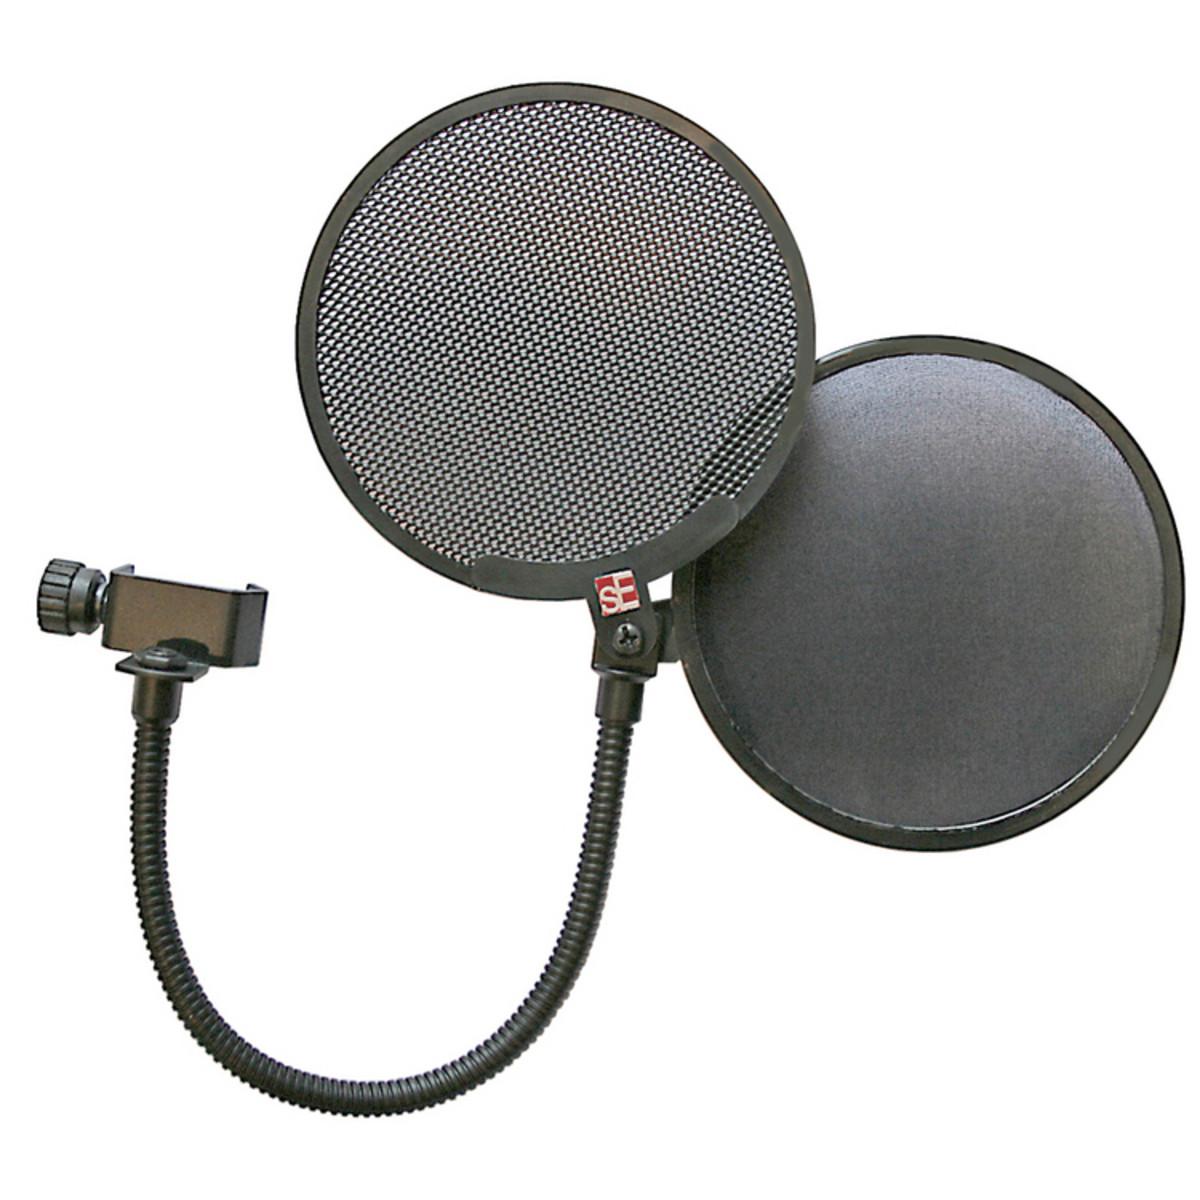 Image of sE Electronics Dual Pro Studio Pop Shield